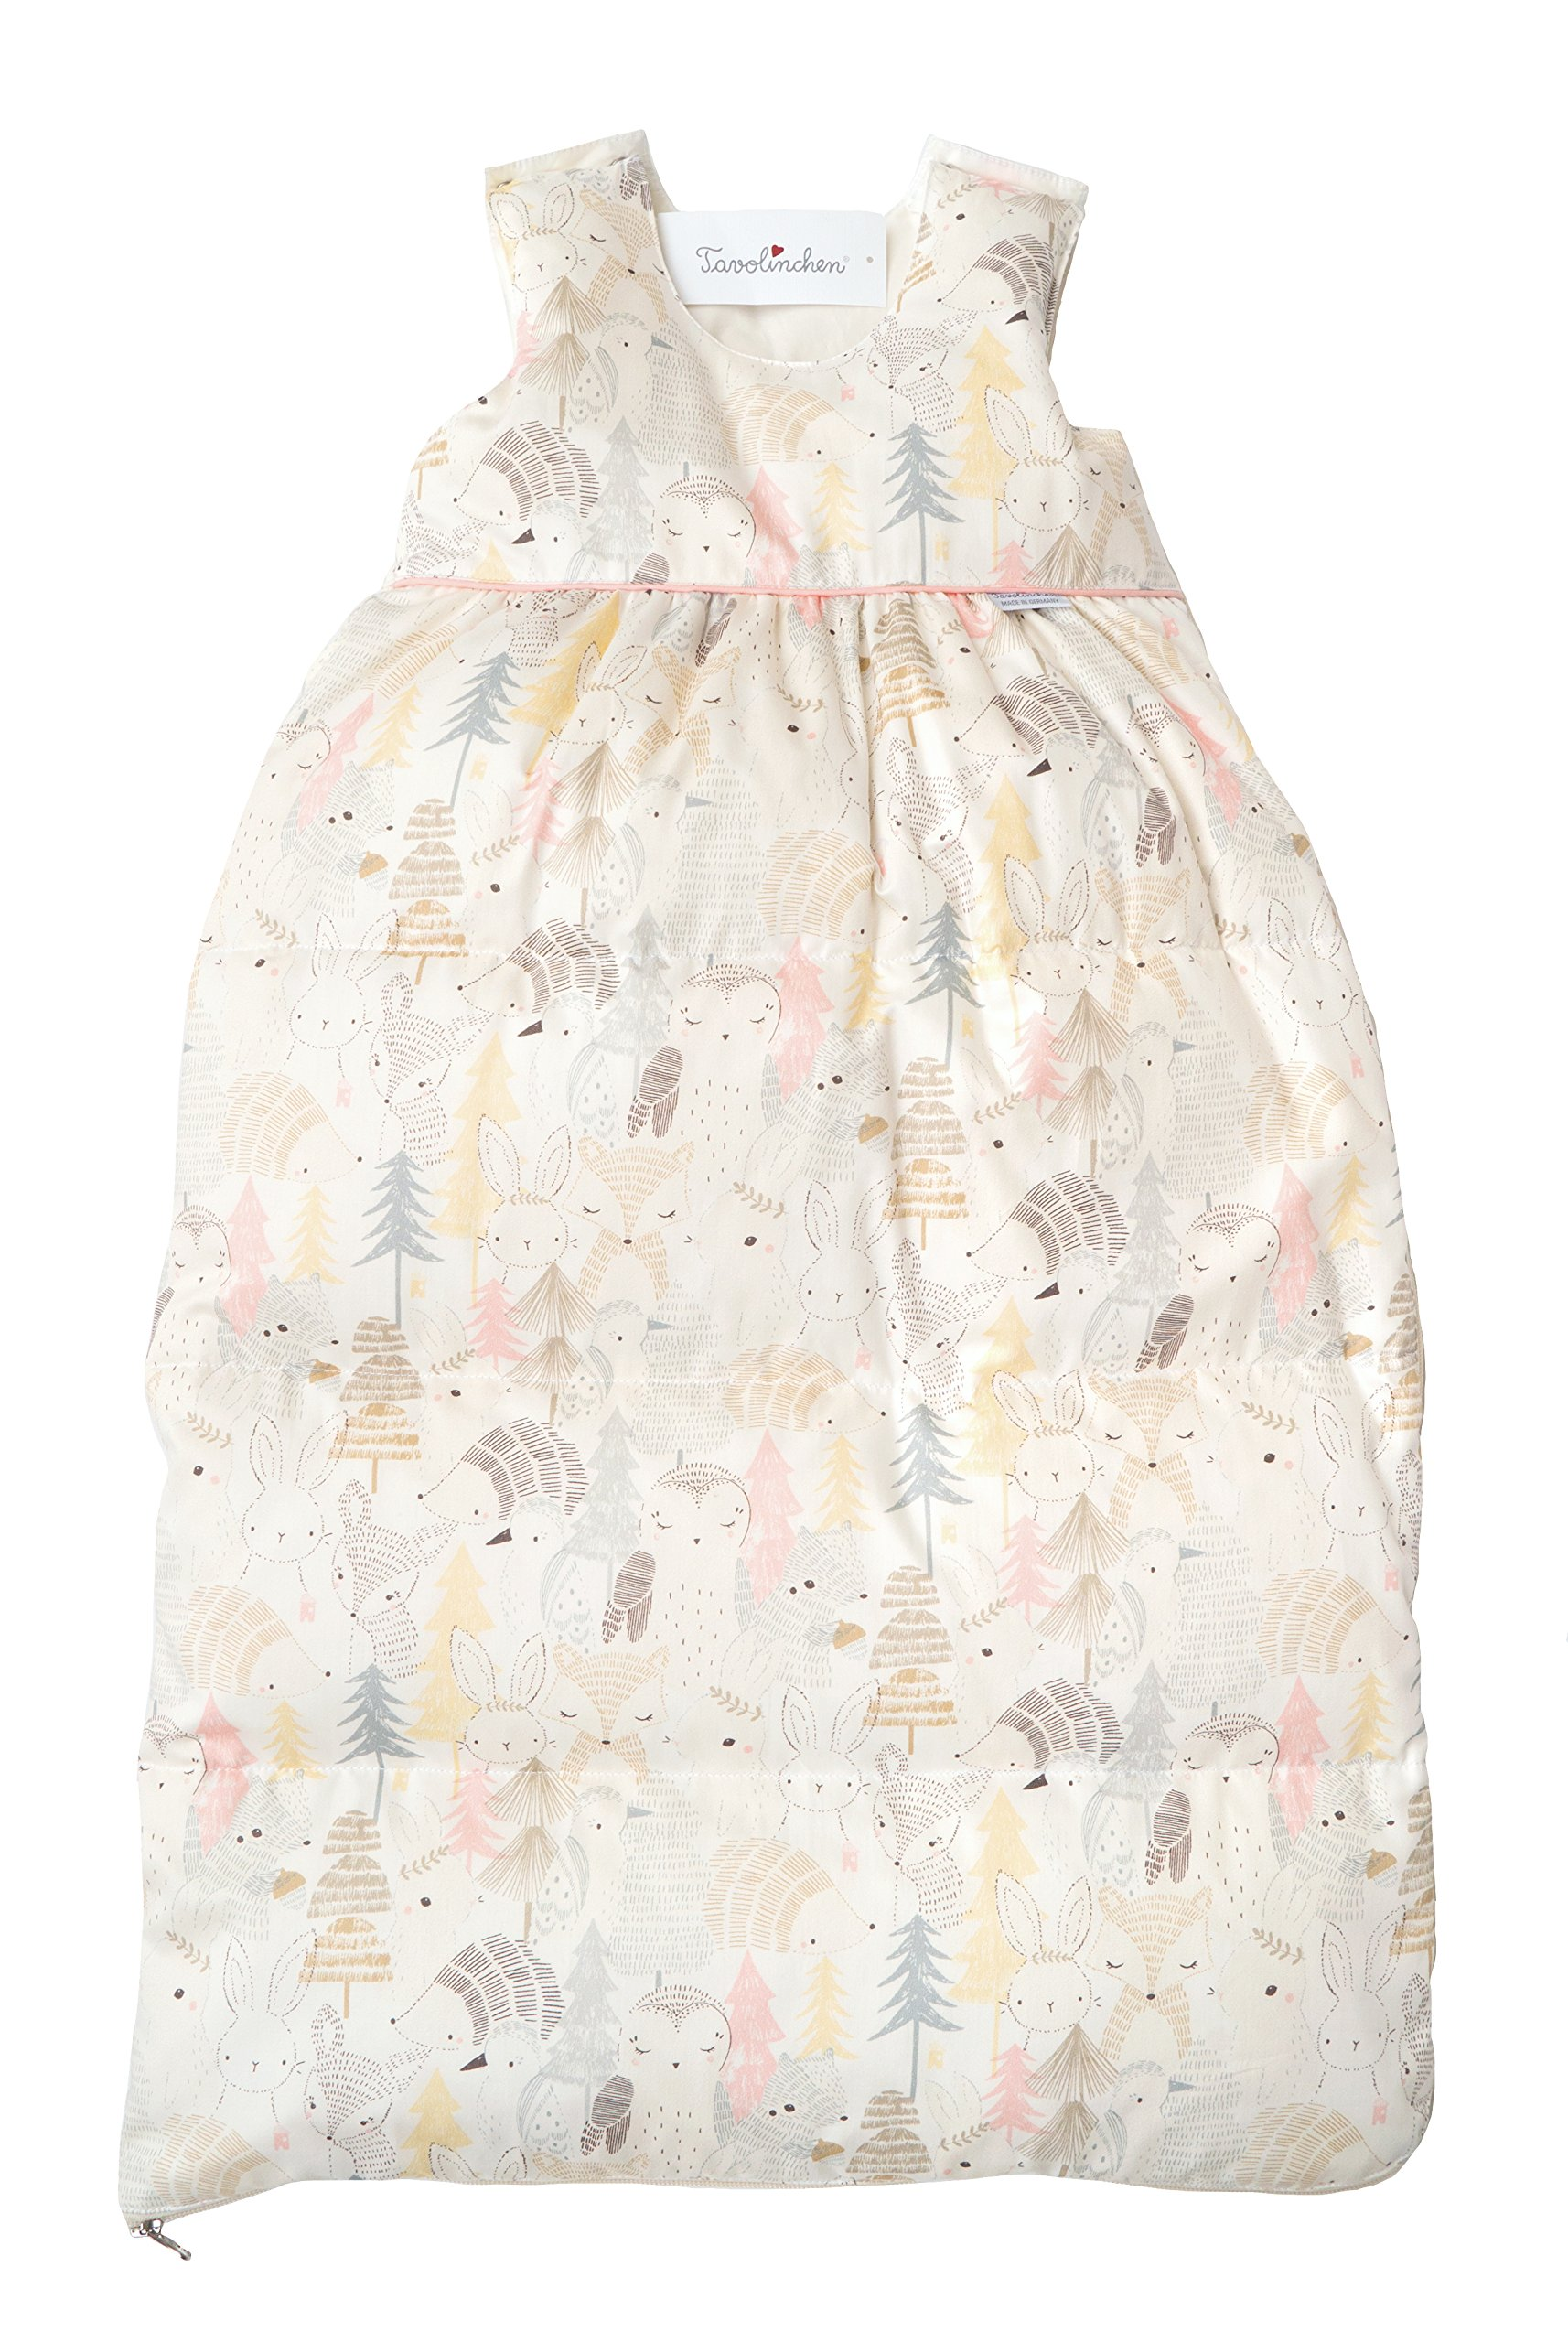 Tavolinchen Baby Sleeping bag''Animals from'' down sleeping bag childrensleeping bag (90cm (9-18m.), rose)